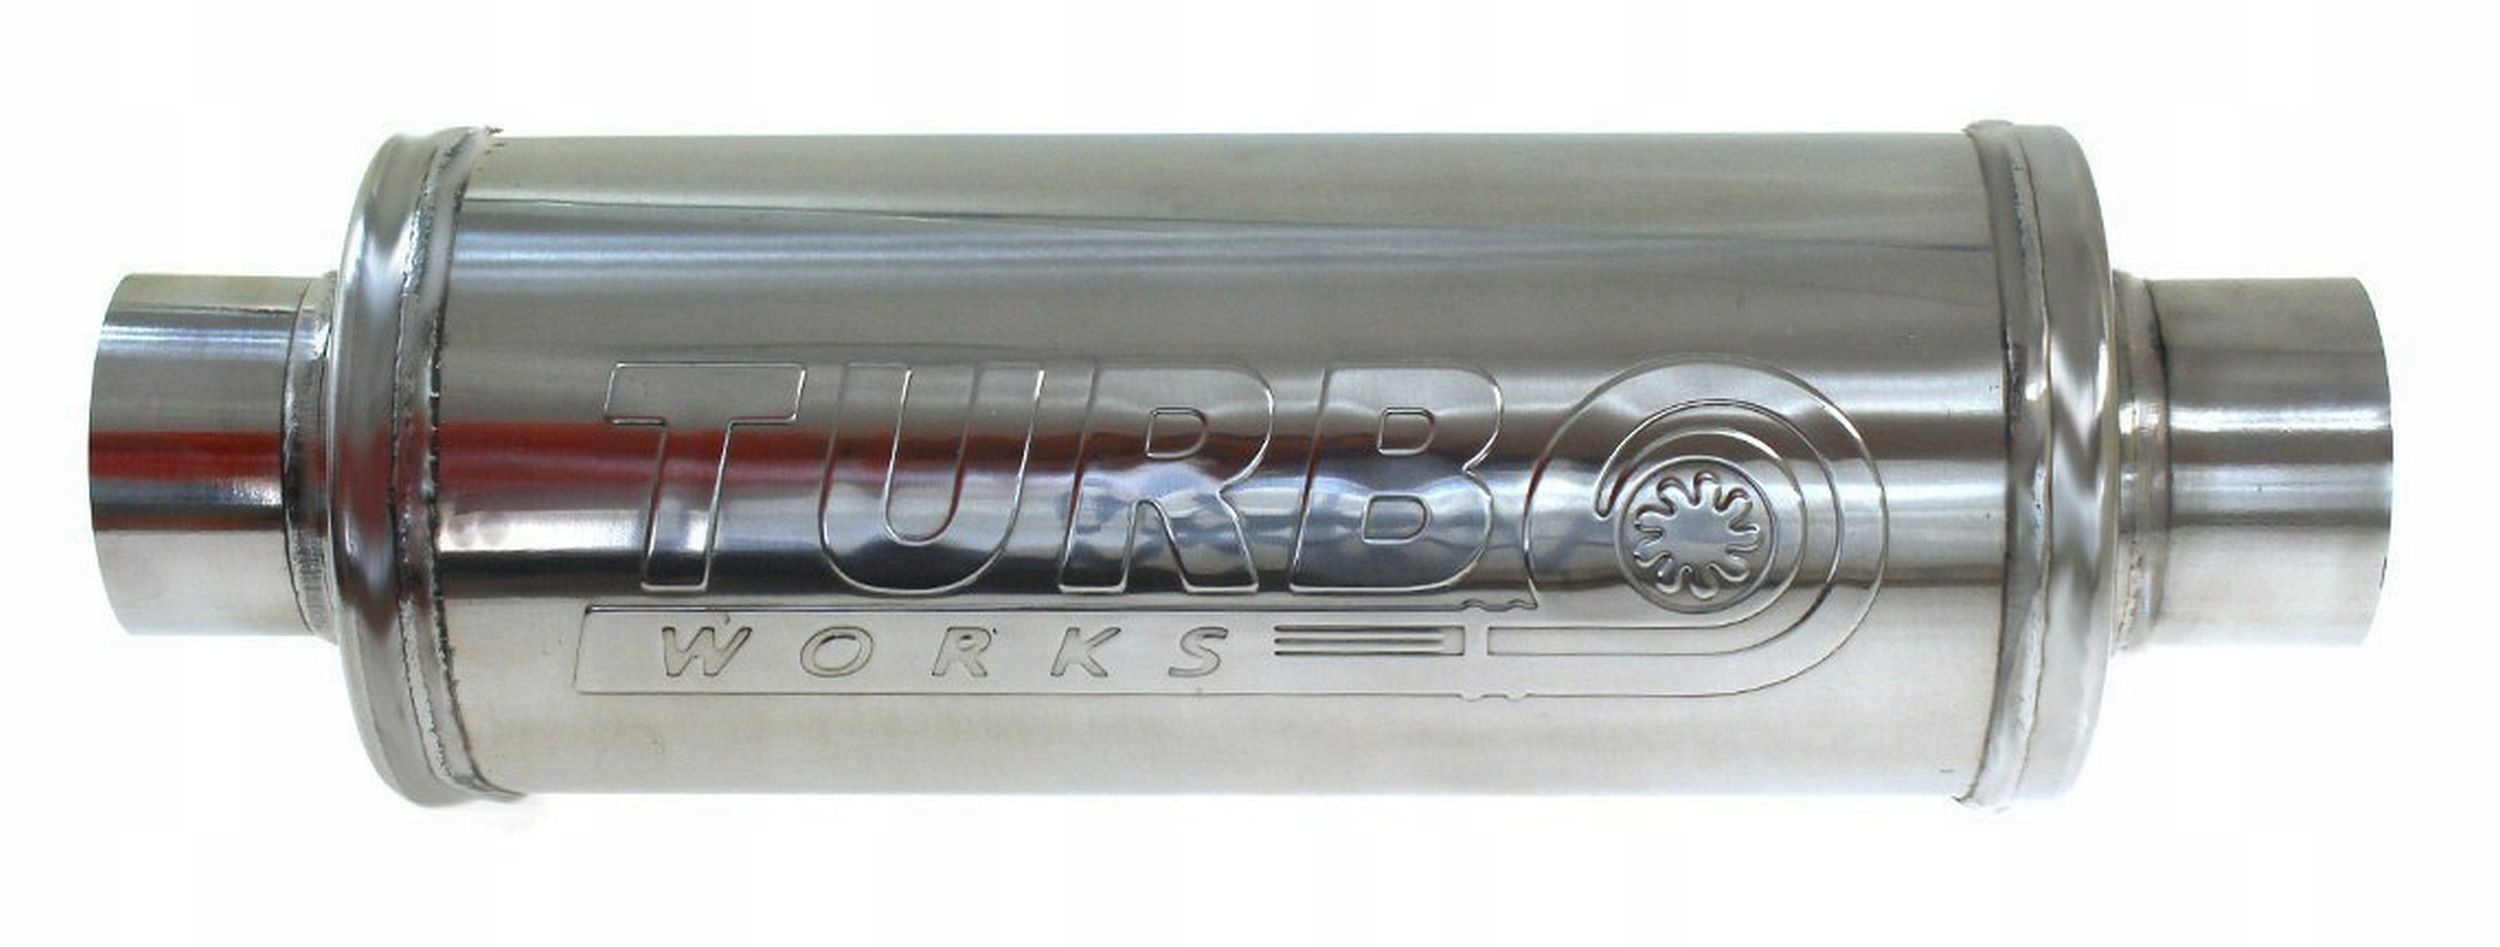 глушитель Средний 2 25'' 300mm спортивный turboworks